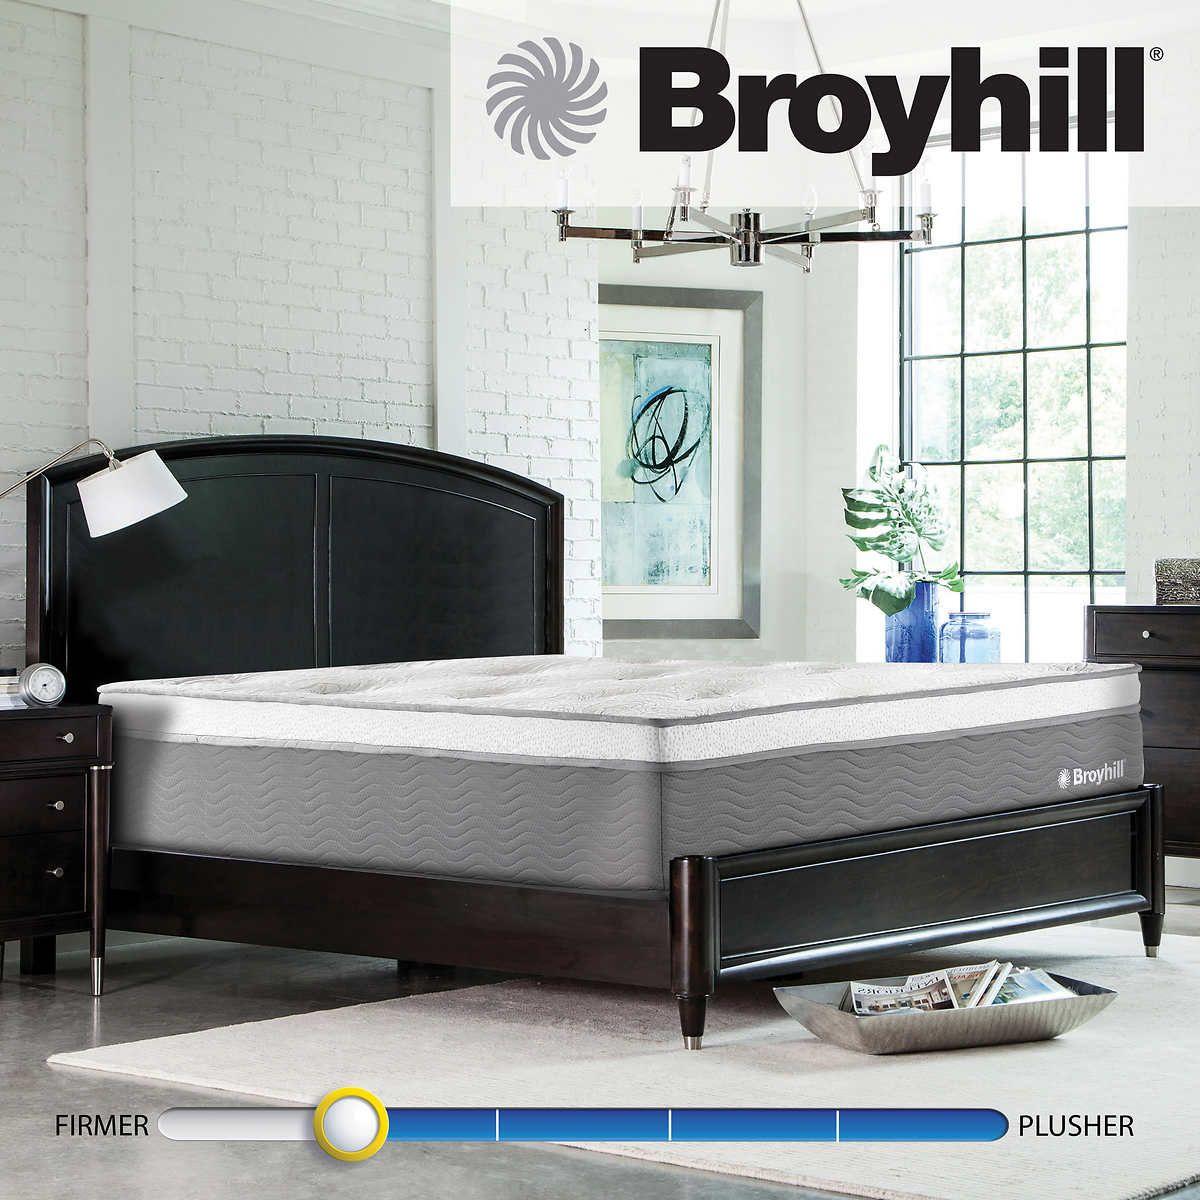 "Broyhill Bristol 14"" King Gel Memory Foam Hybrid Mattress"